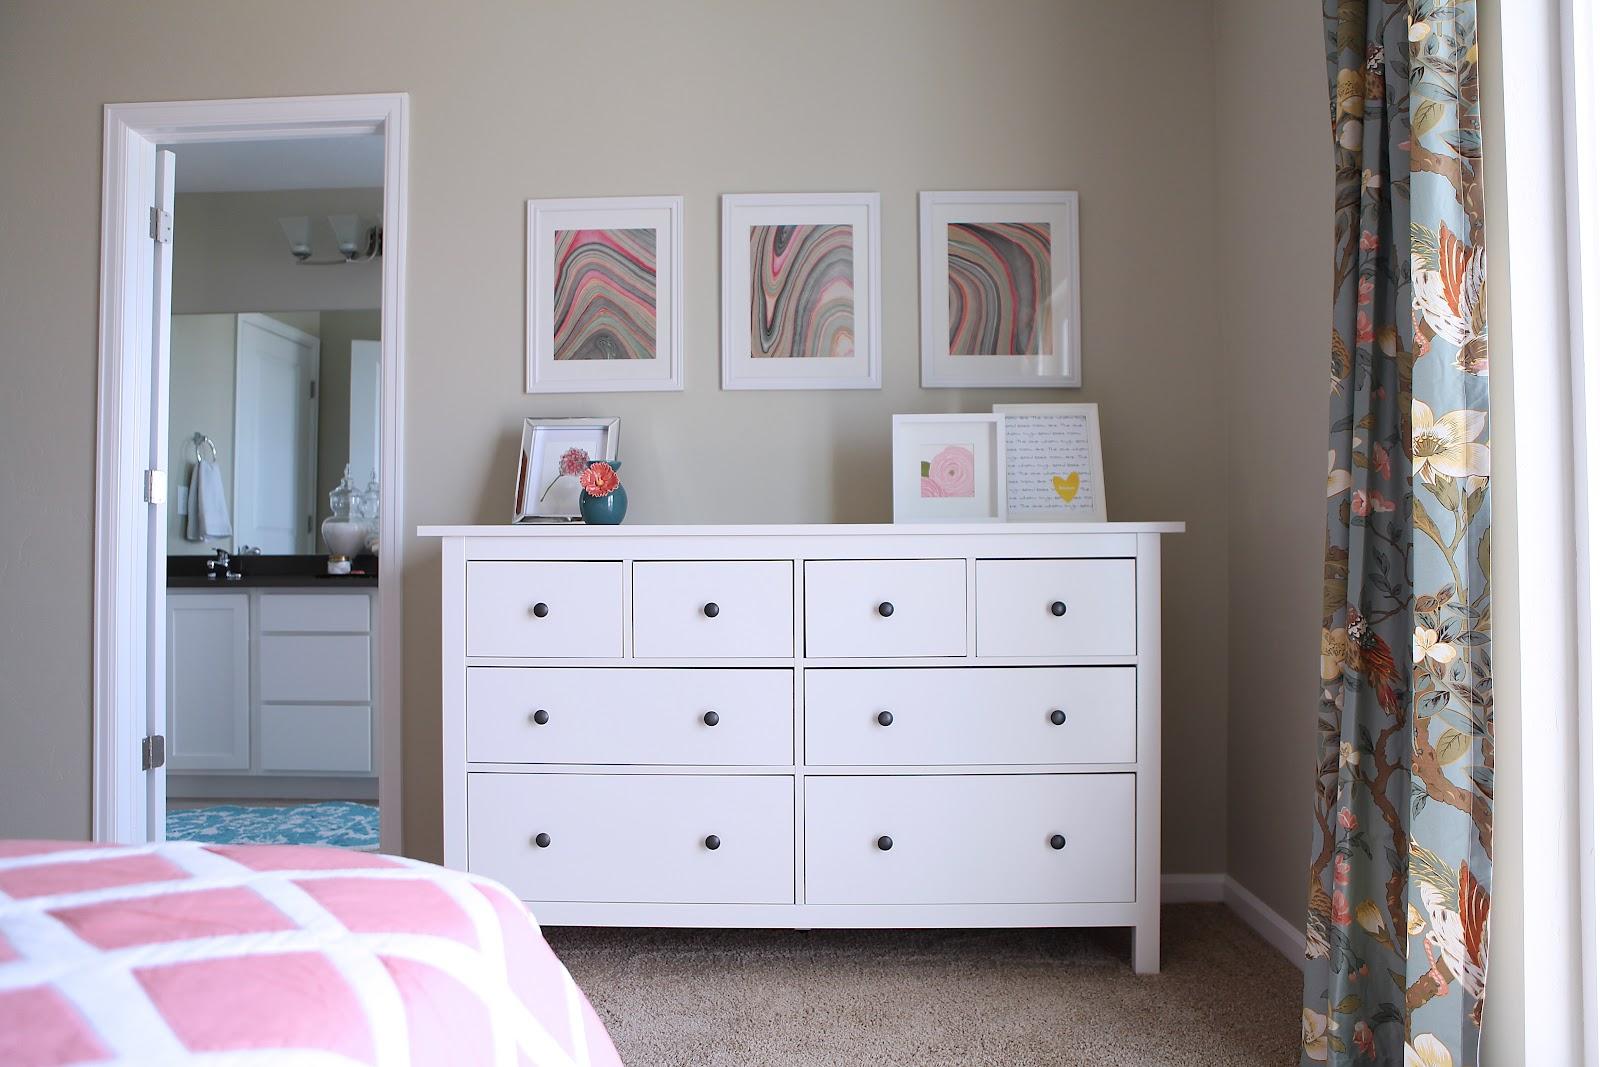 ikea-white-hemnes-bedroom-furniture-photo-7